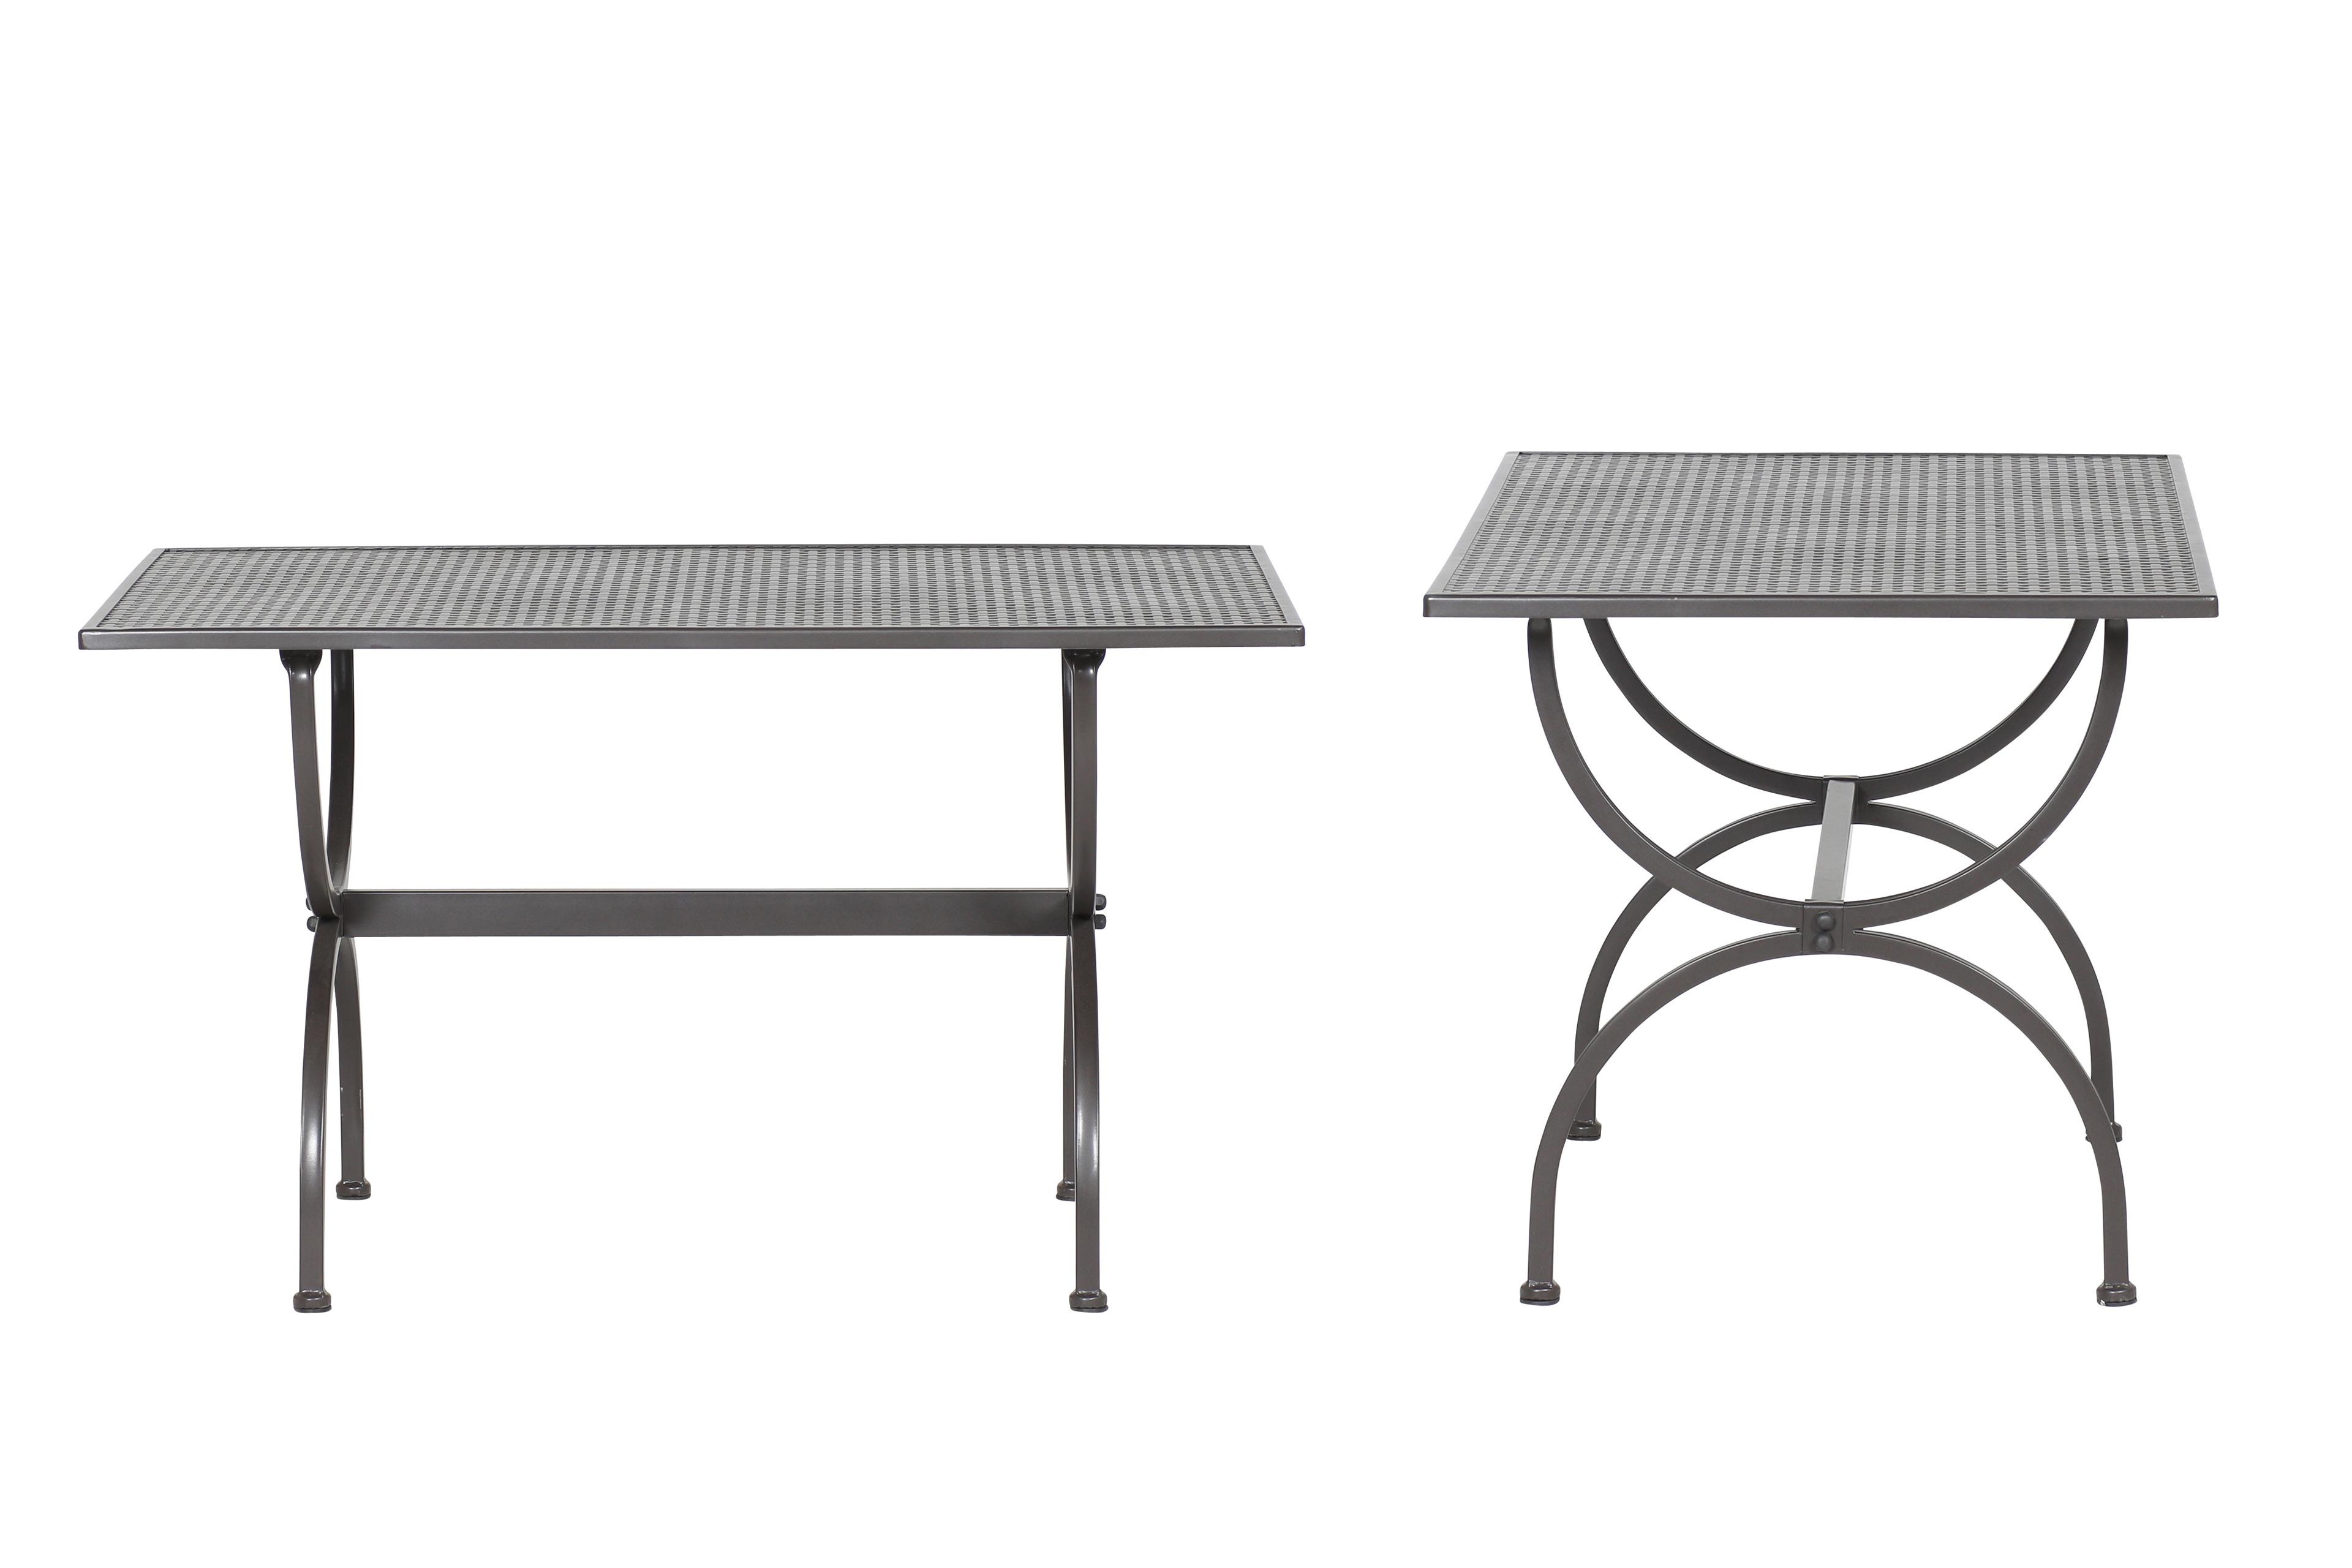 mbm gartenm bel set romeo aus schmiedeeisen m bel letz. Black Bedroom Furniture Sets. Home Design Ideas